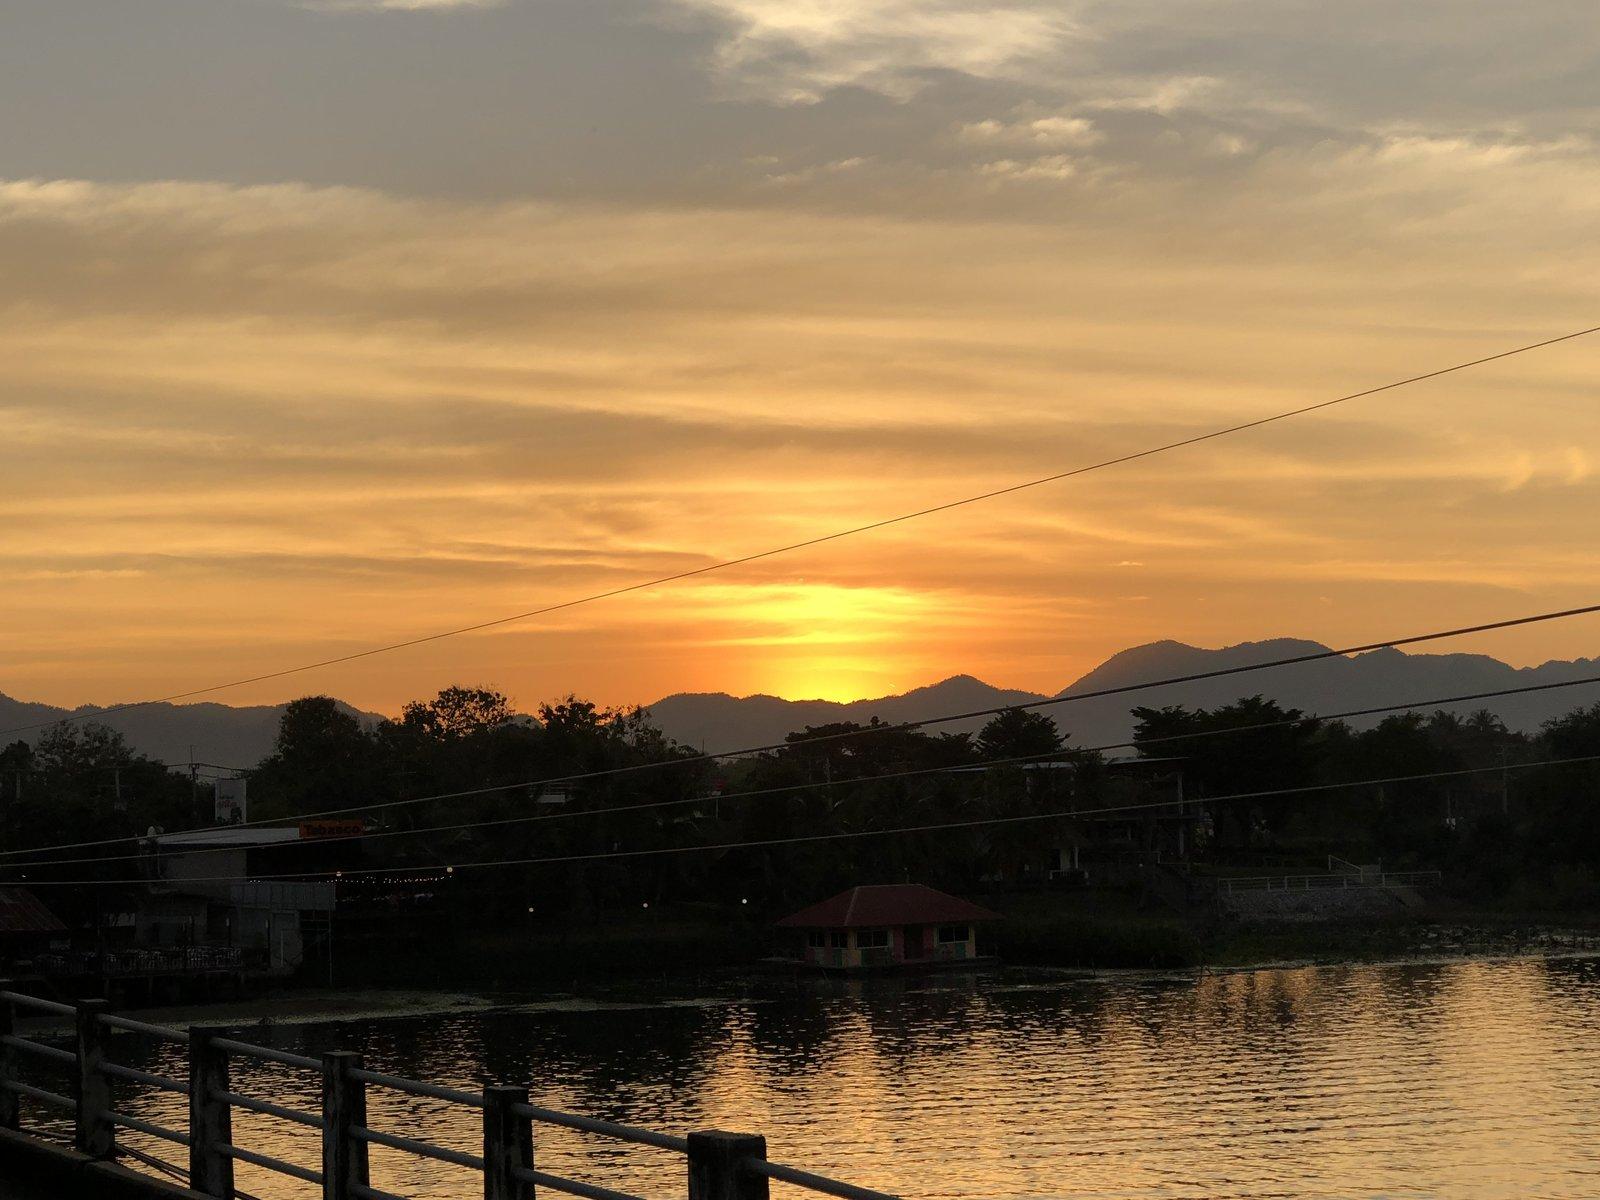 Sunset in Kanchanaburi December 2018